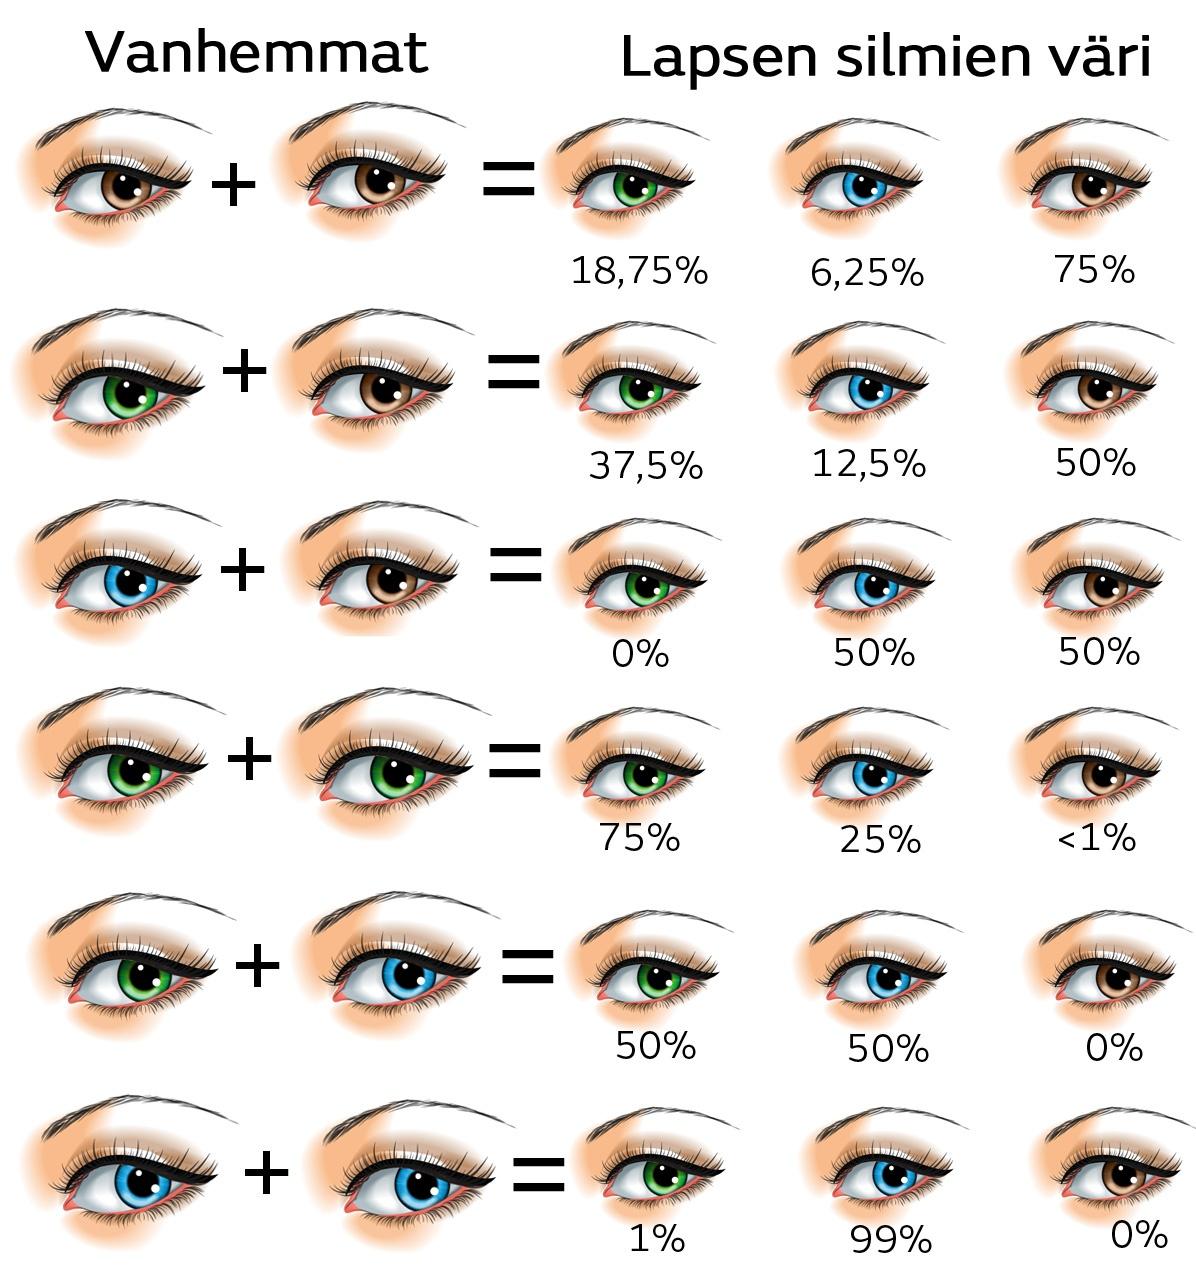 Minkä väriset silmät lapsi saa